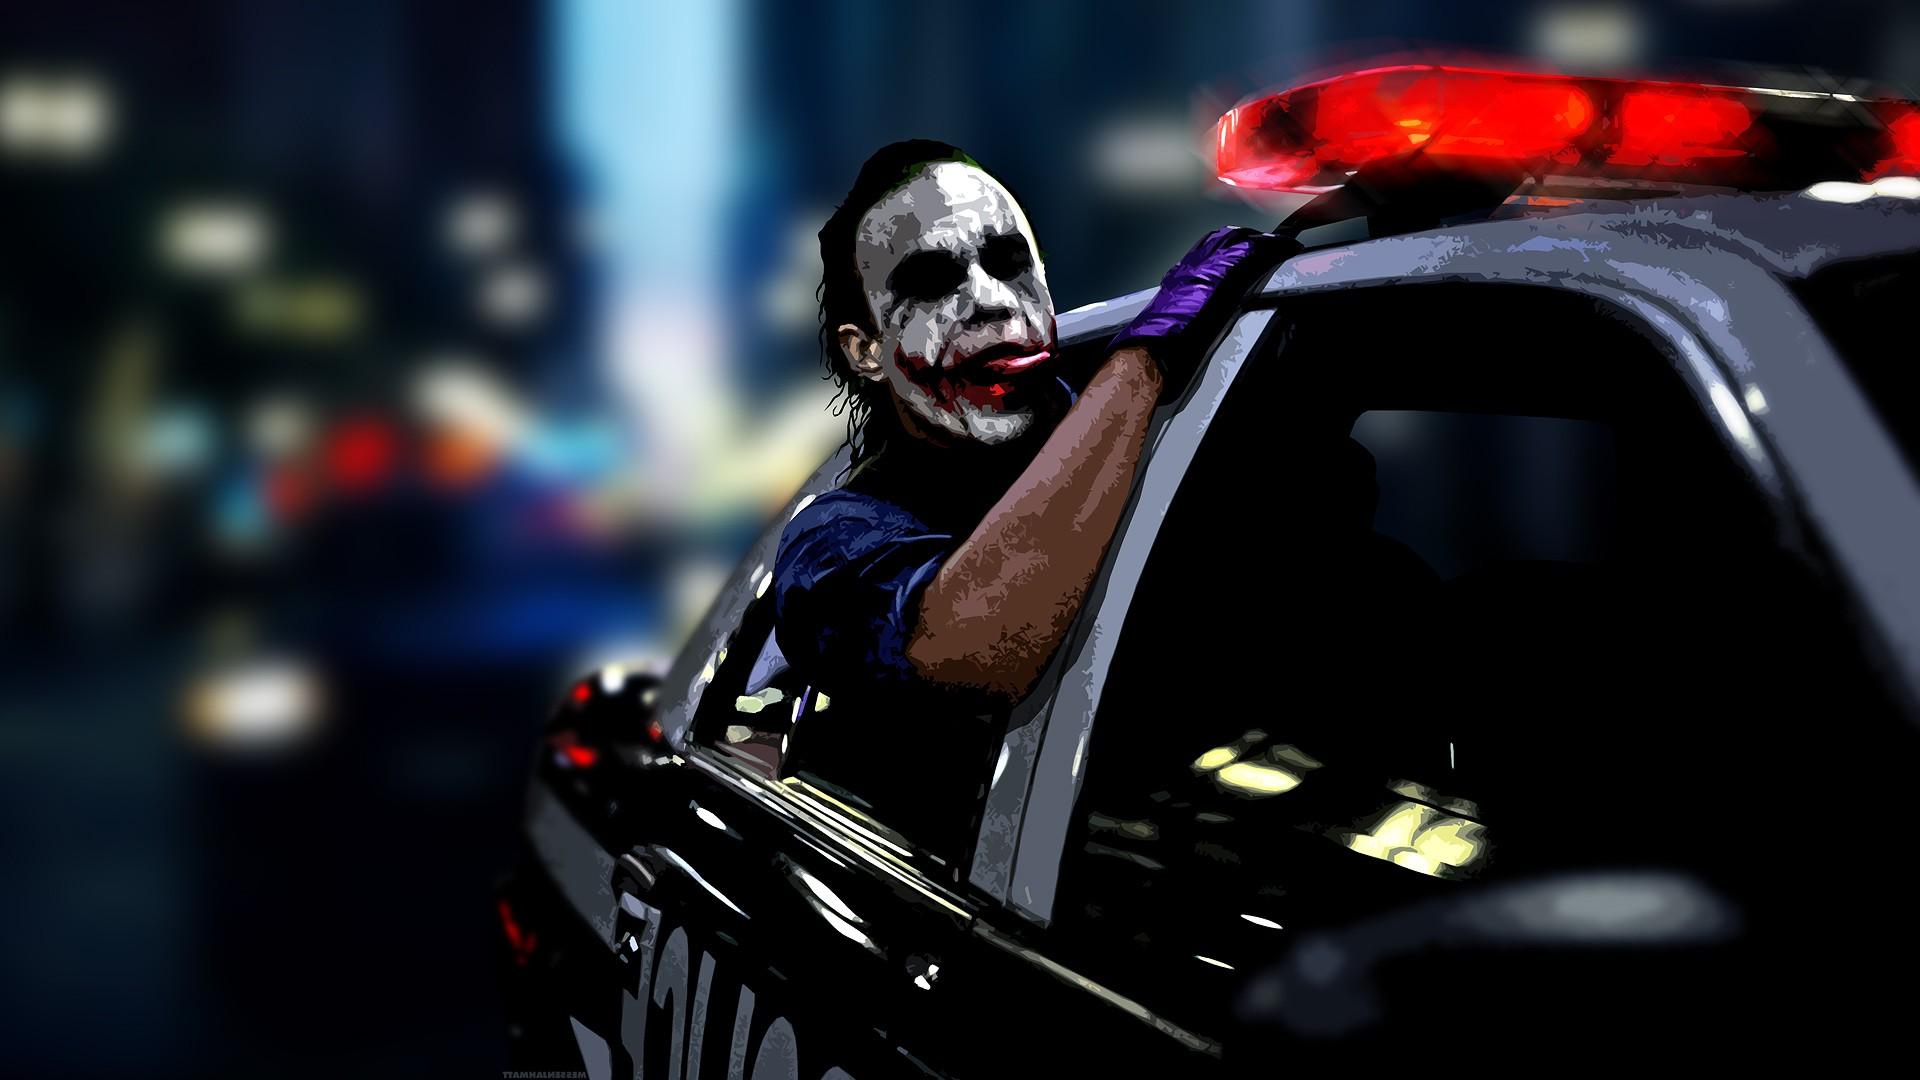 Digital Art Police Anime Car Vehicle Batman Joker Heath Ledger MessenjahMatt Darkness 1920x1080 Px Automotive Design